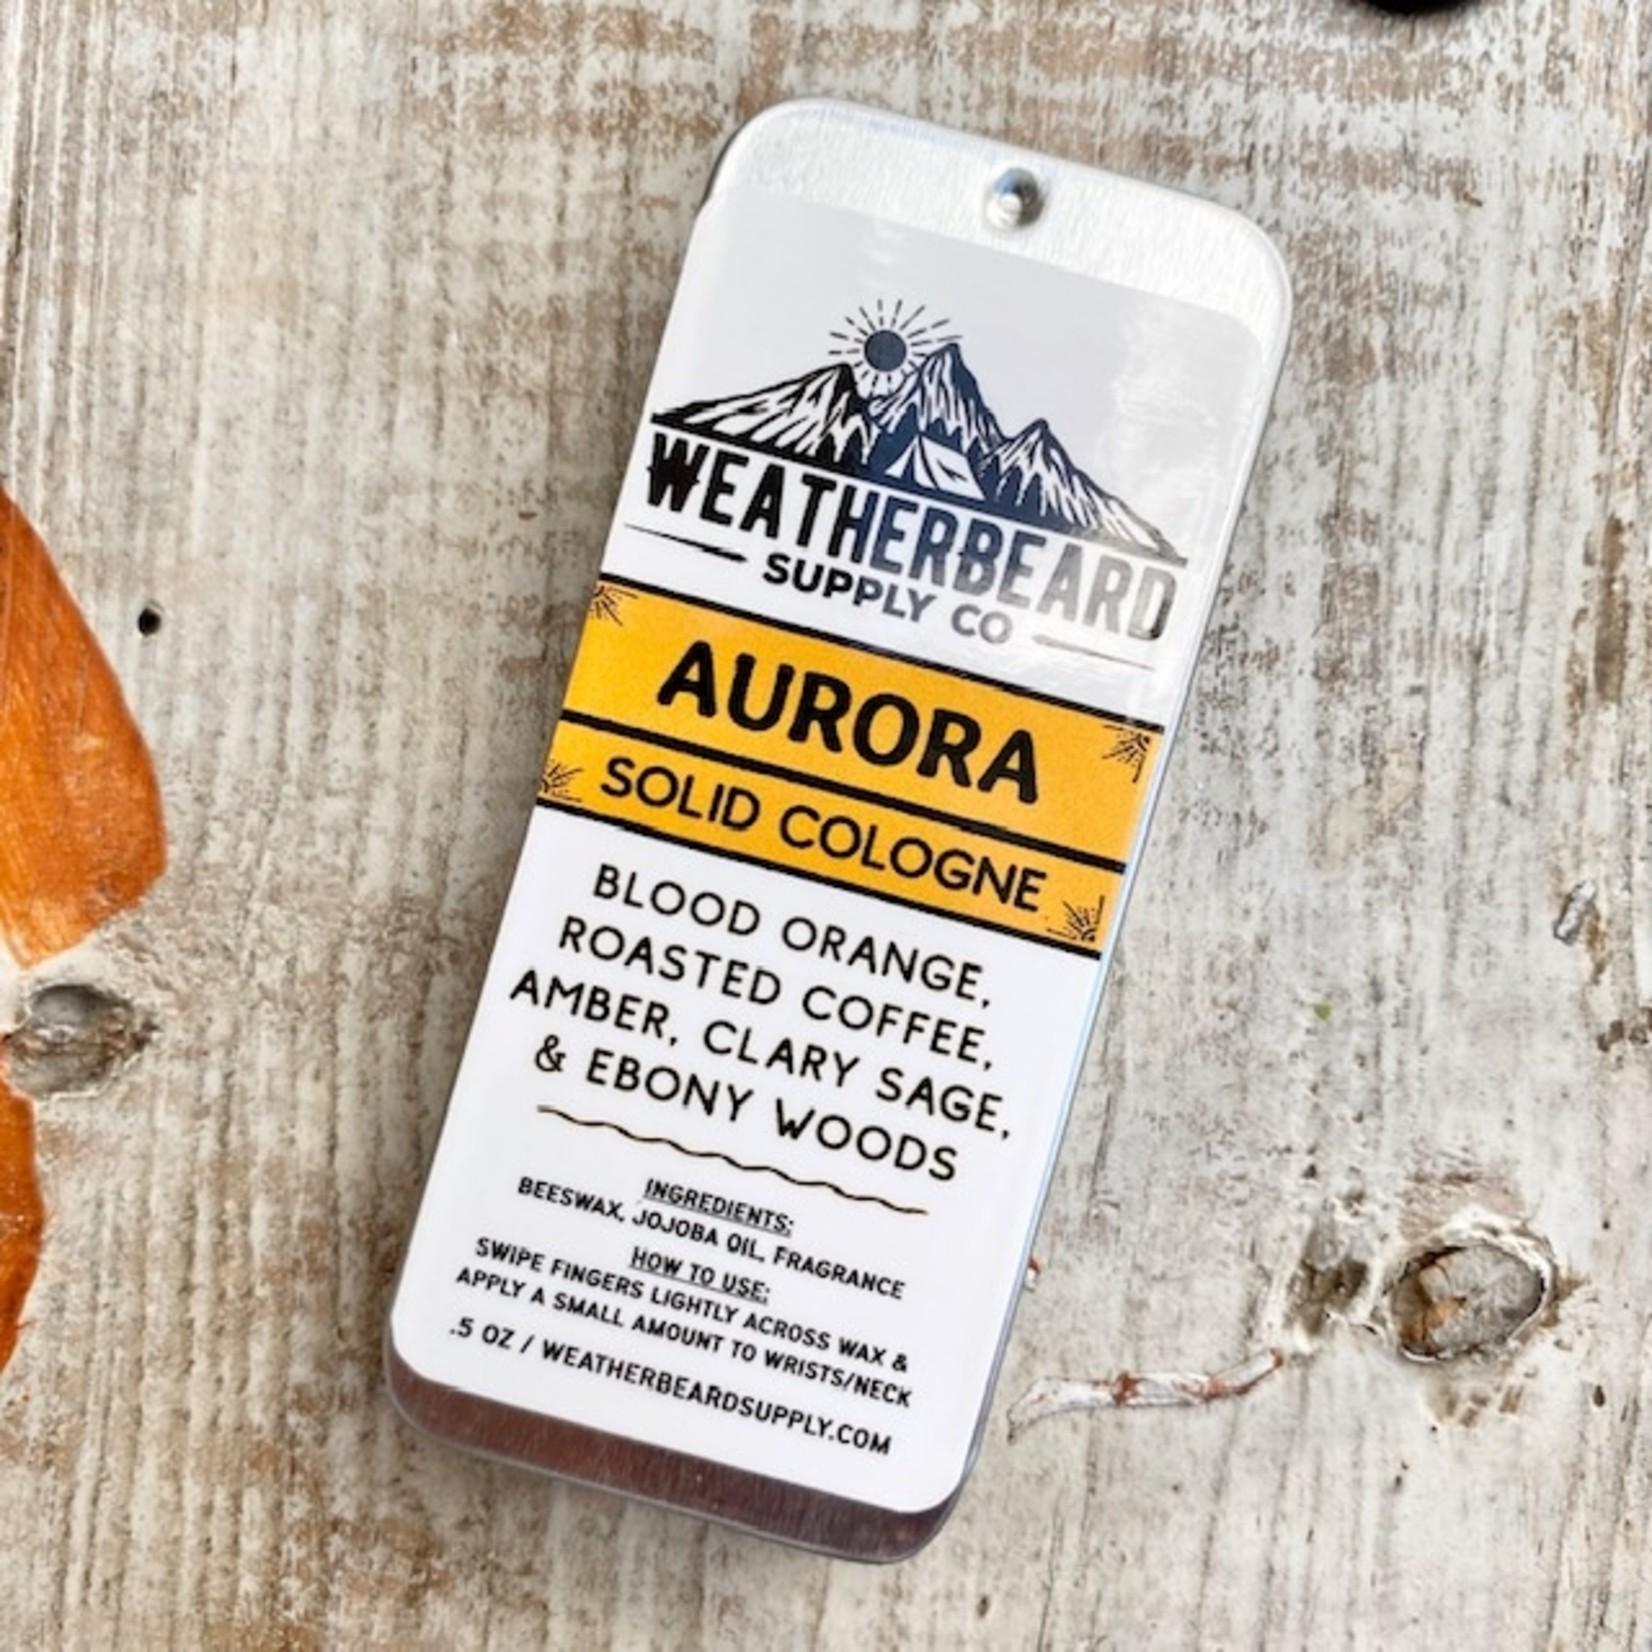 WeatherBeard Supply Co. Weatherbeard Solid Cologne Tins